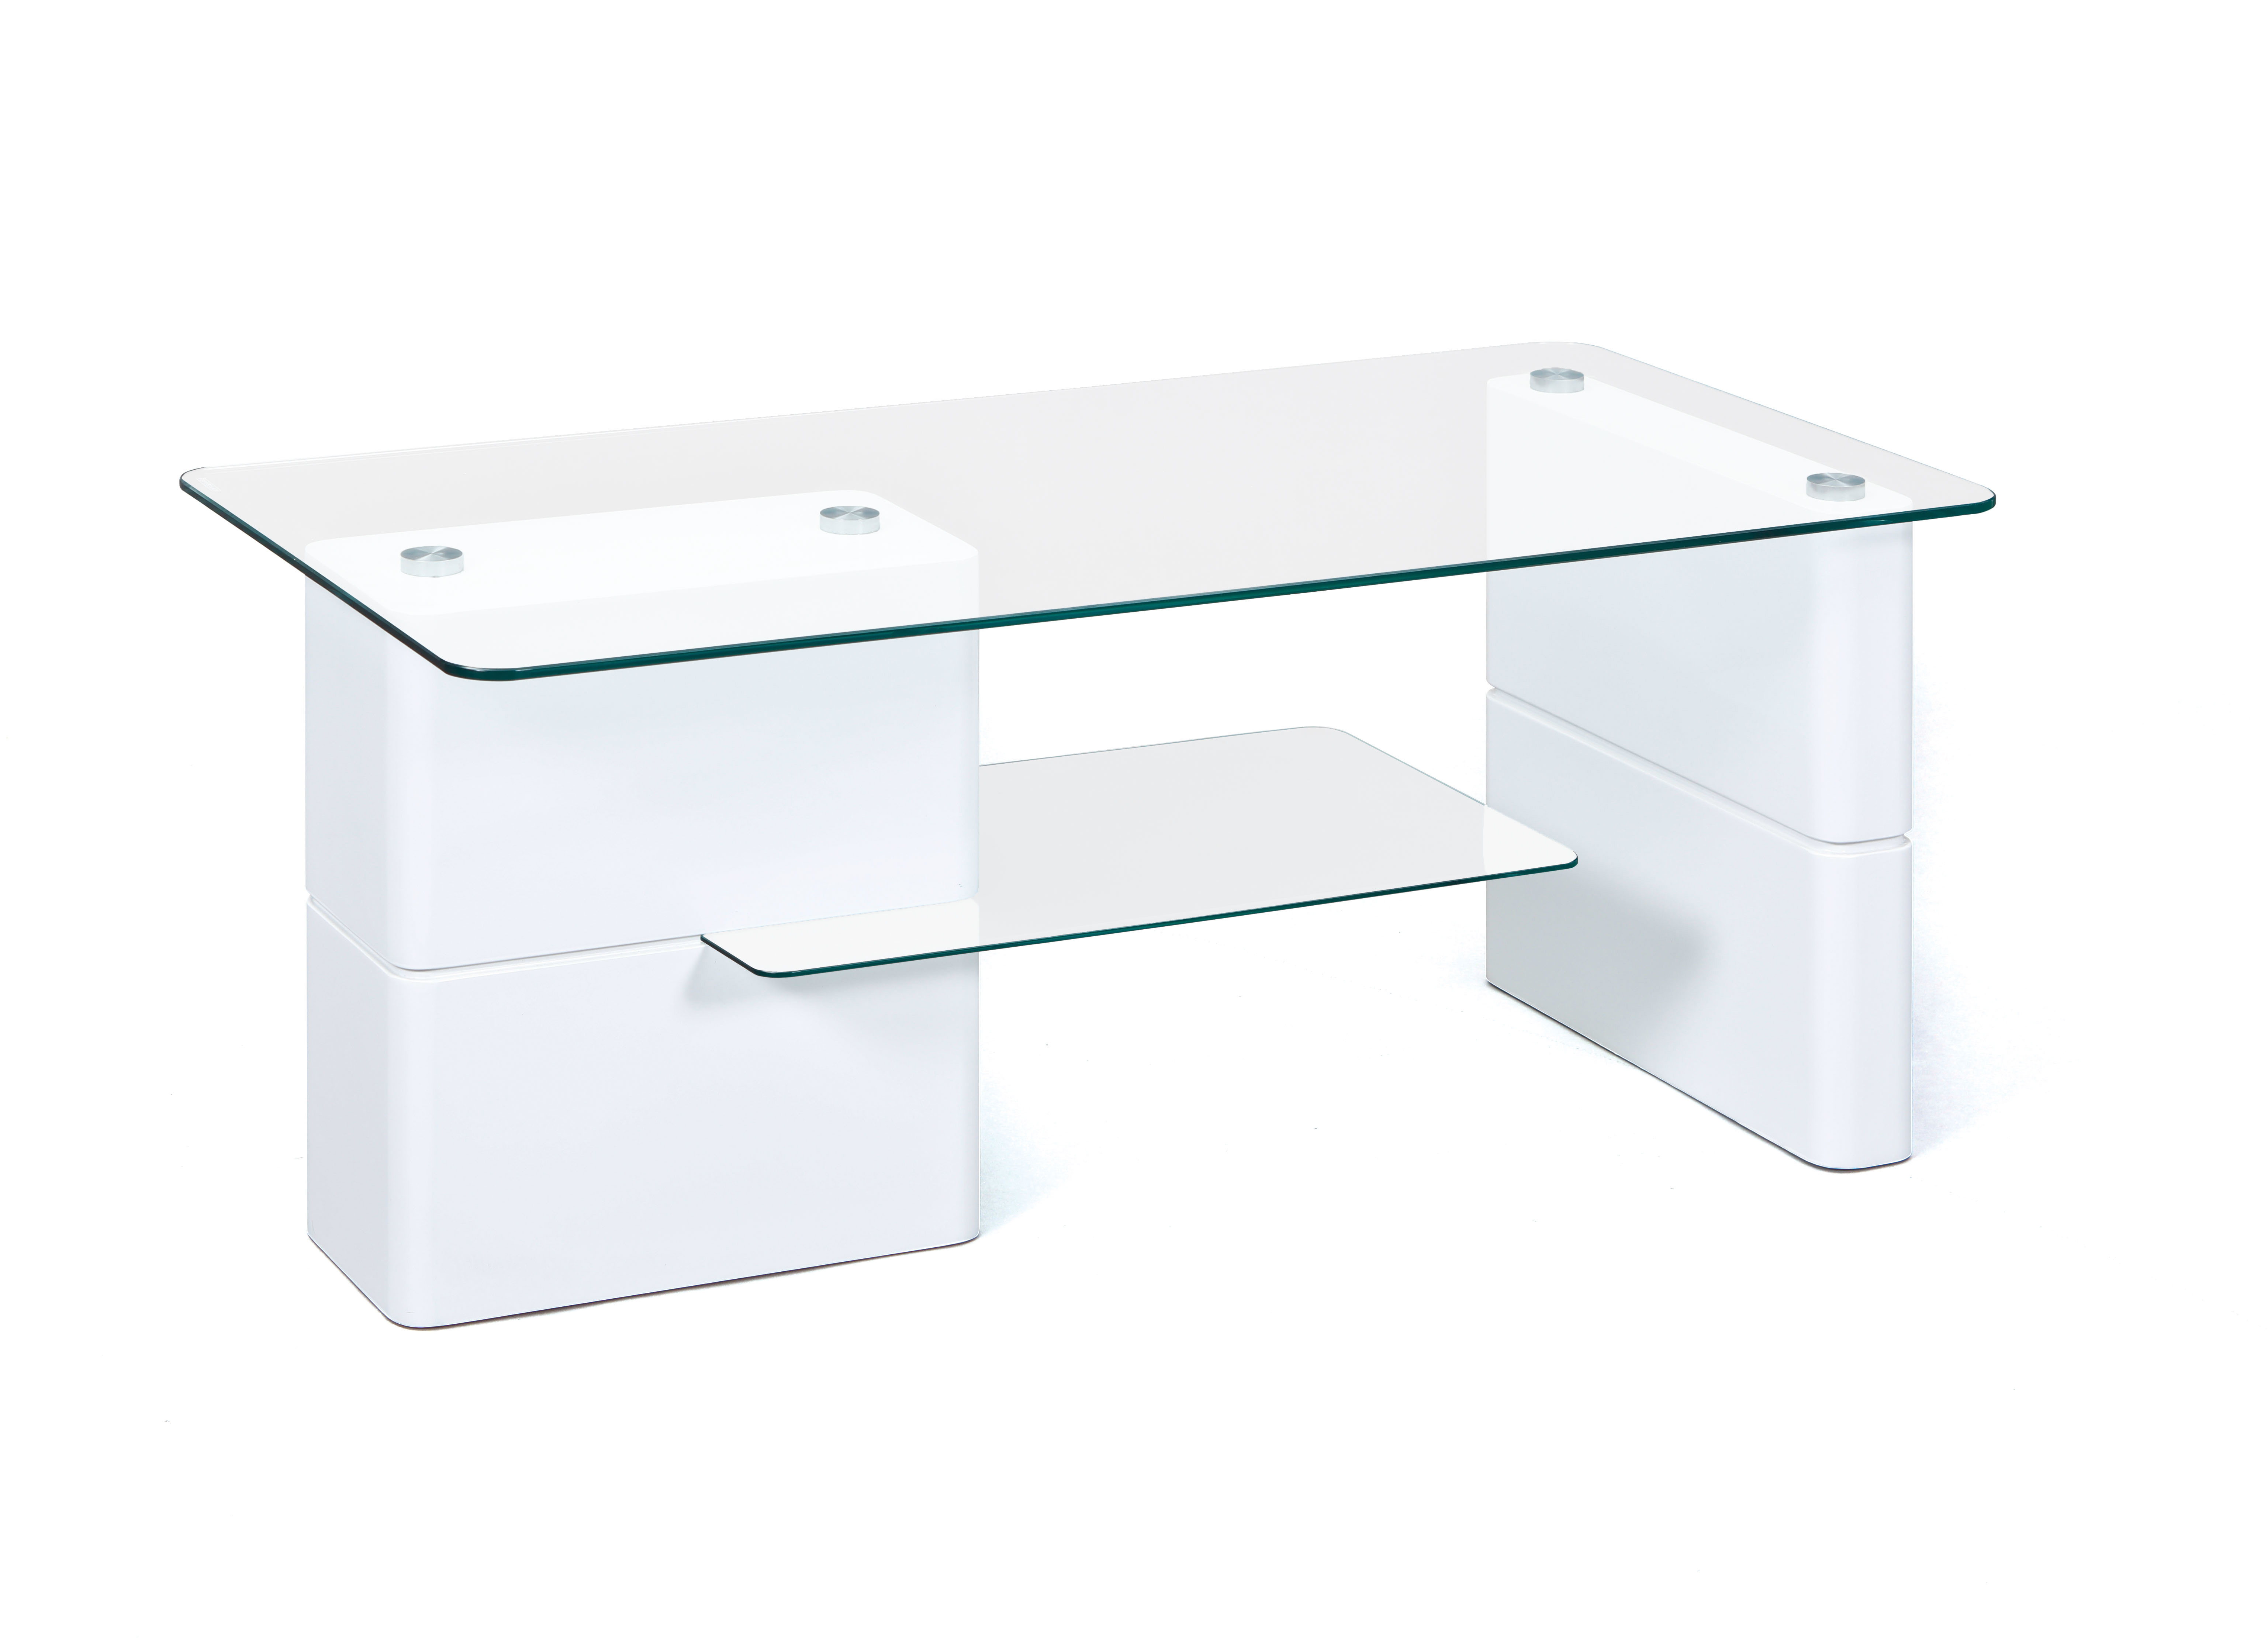 Table basse moderne blanche en verre Clea